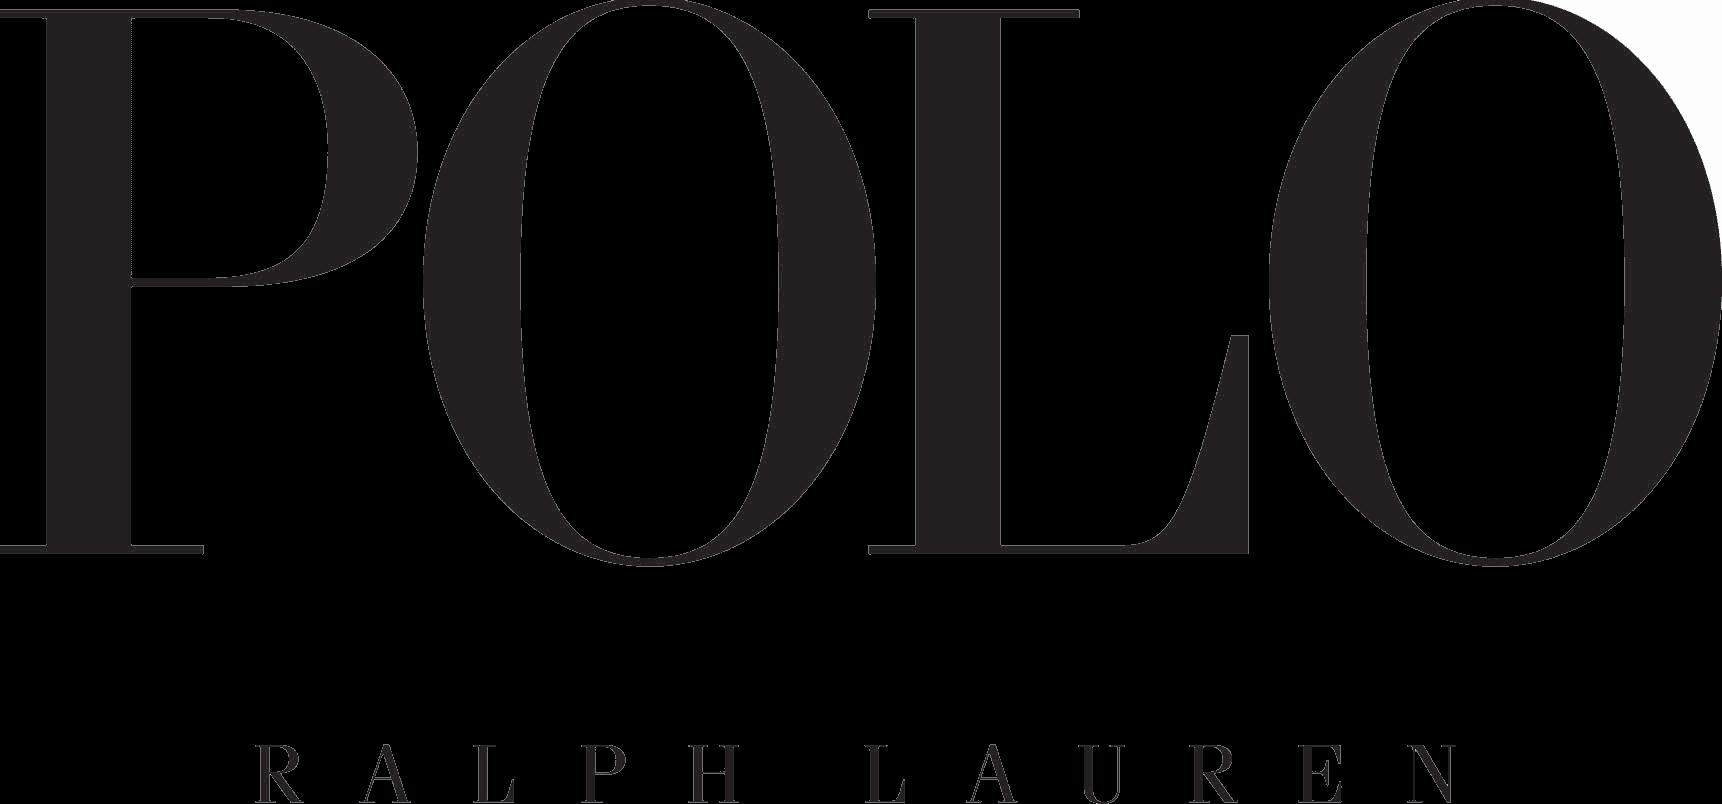 ralph lauren logo transparent wwwpixsharkcom images